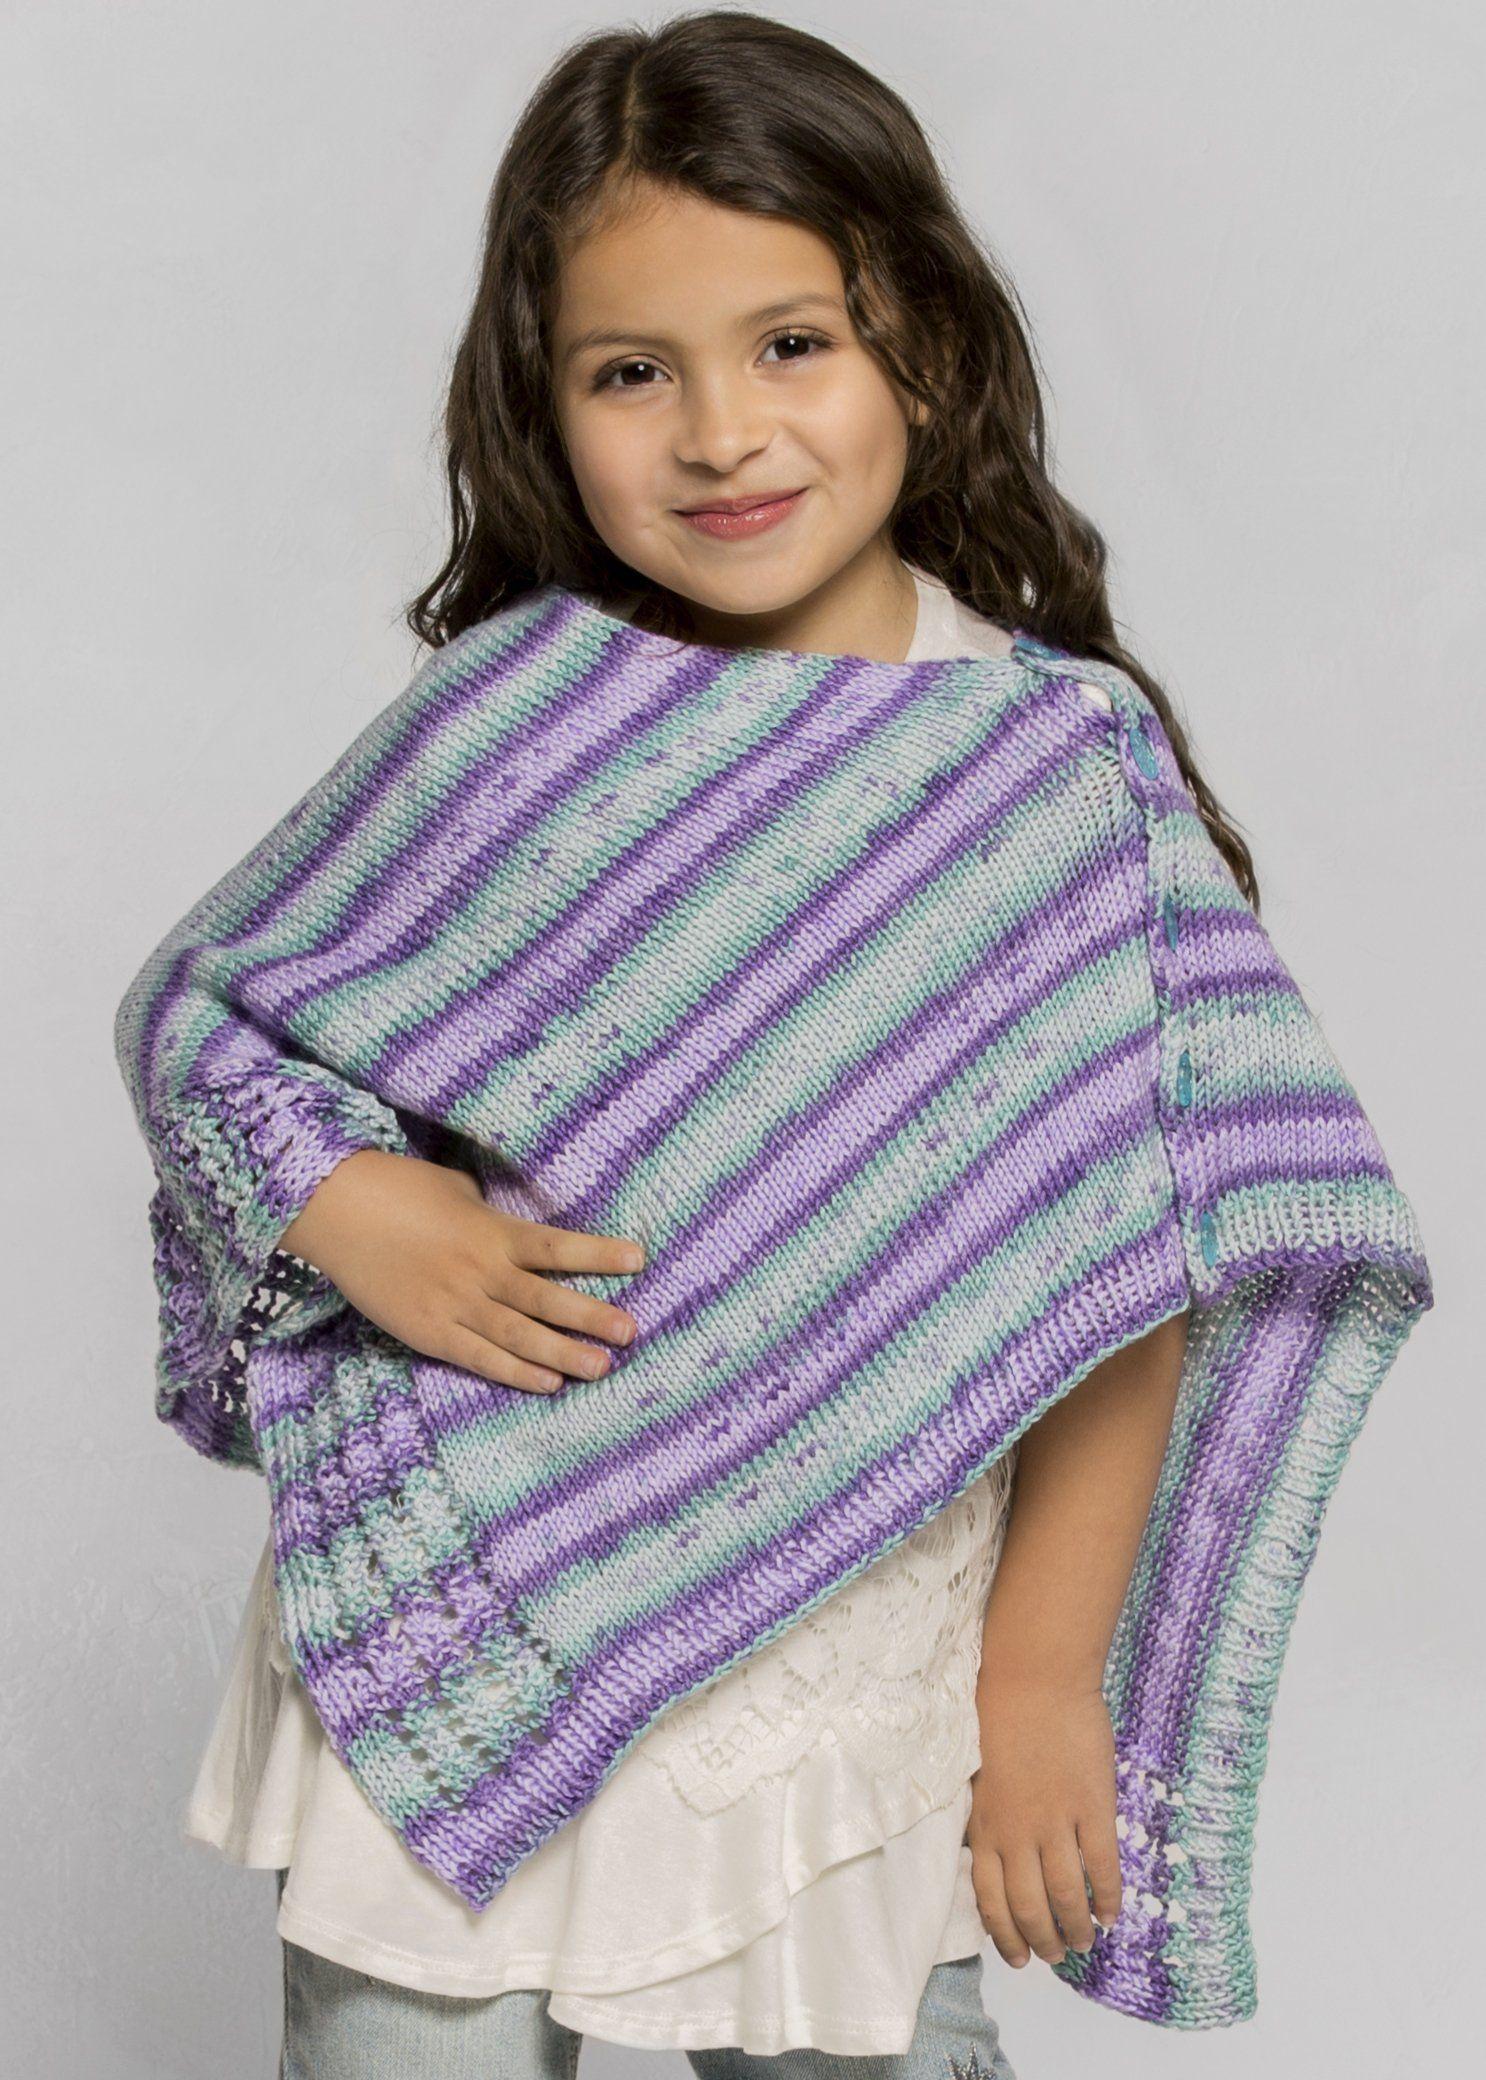 Verbena Poncho | Knitting patterns free, Poncho knitting ...